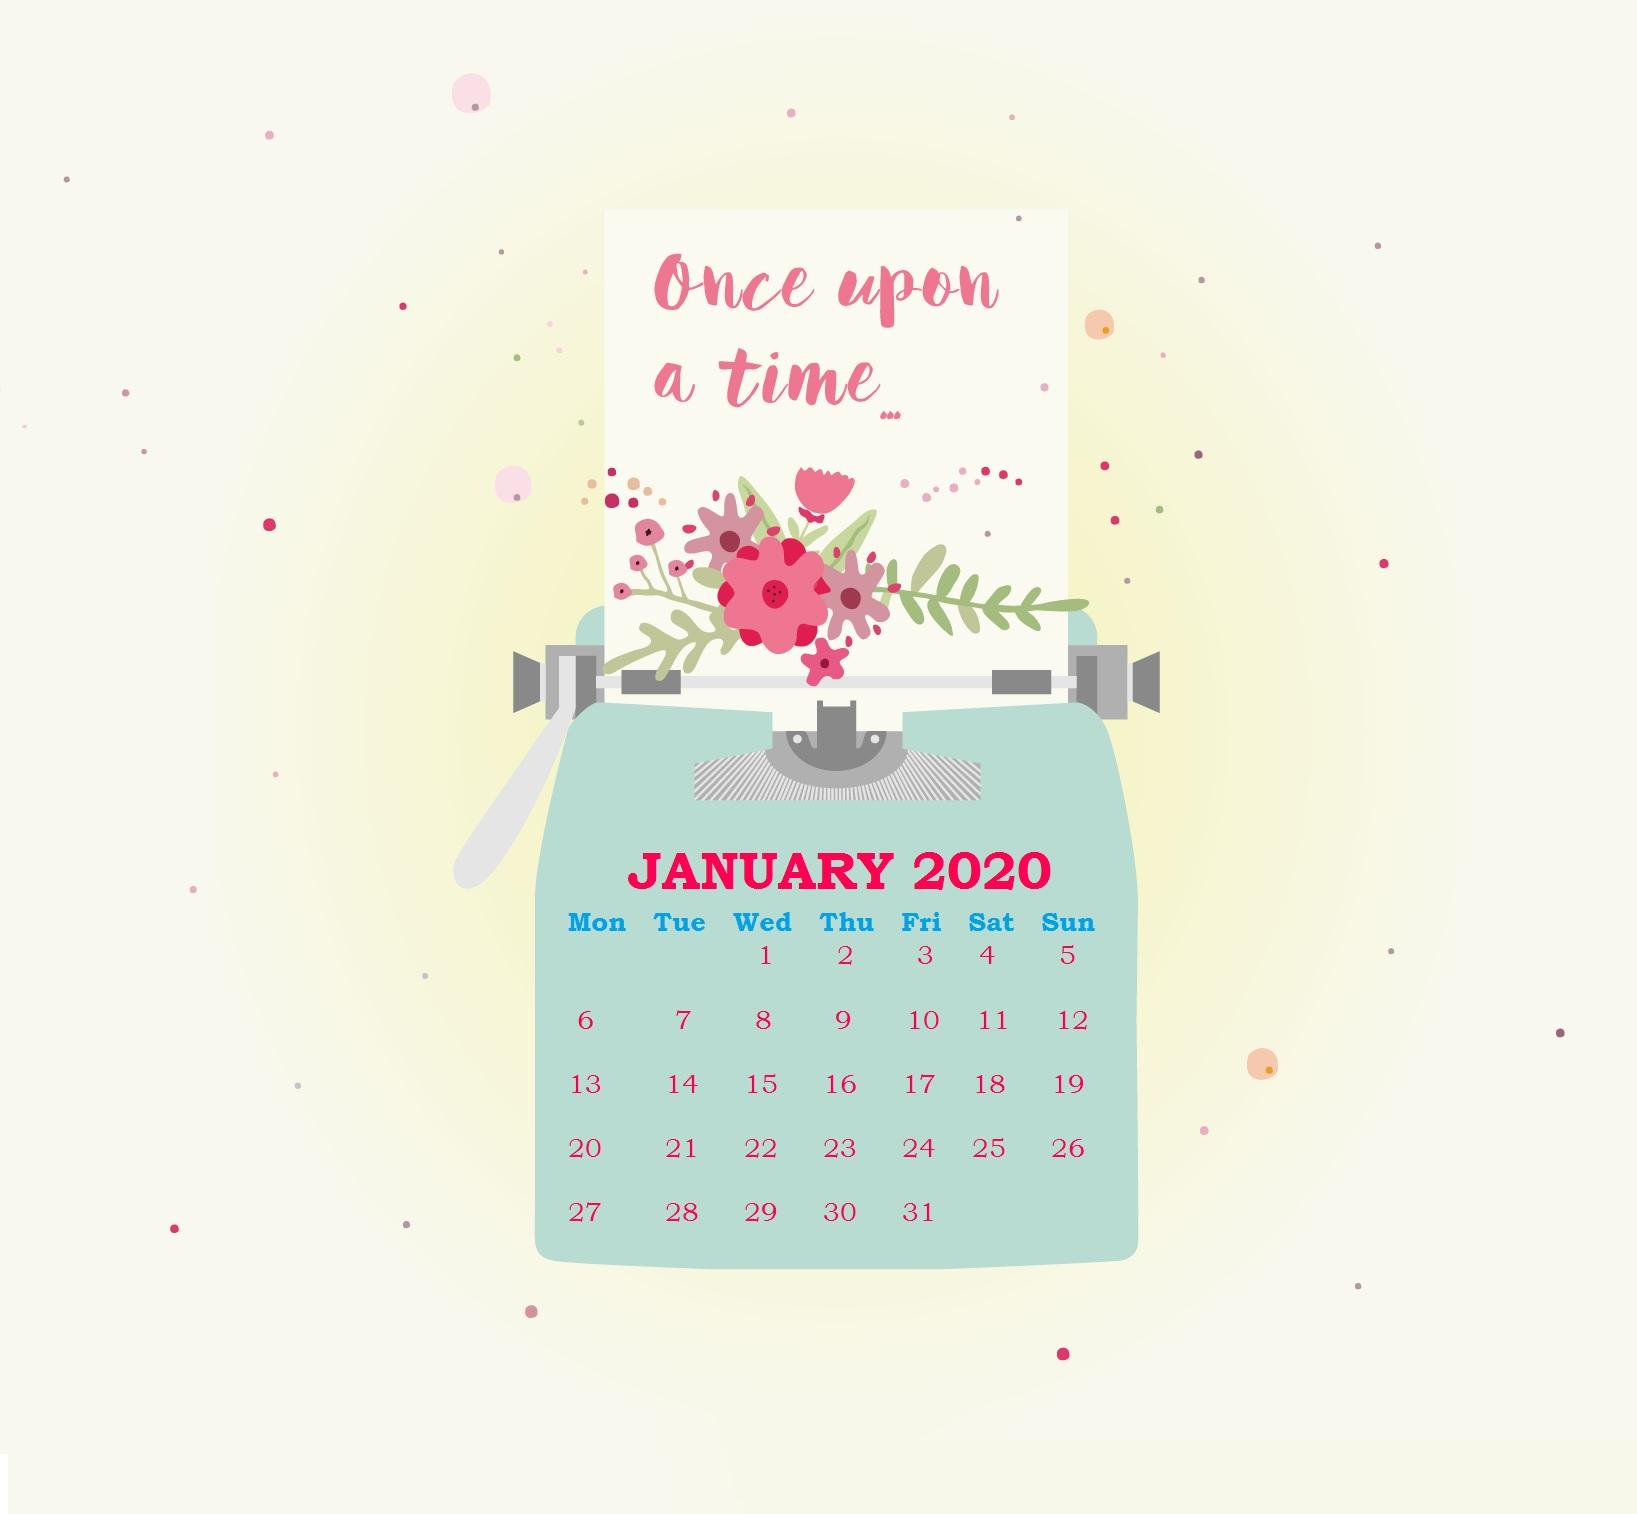 download iPhone January 2020 Wallpaper Calendar Latest 1637x1514